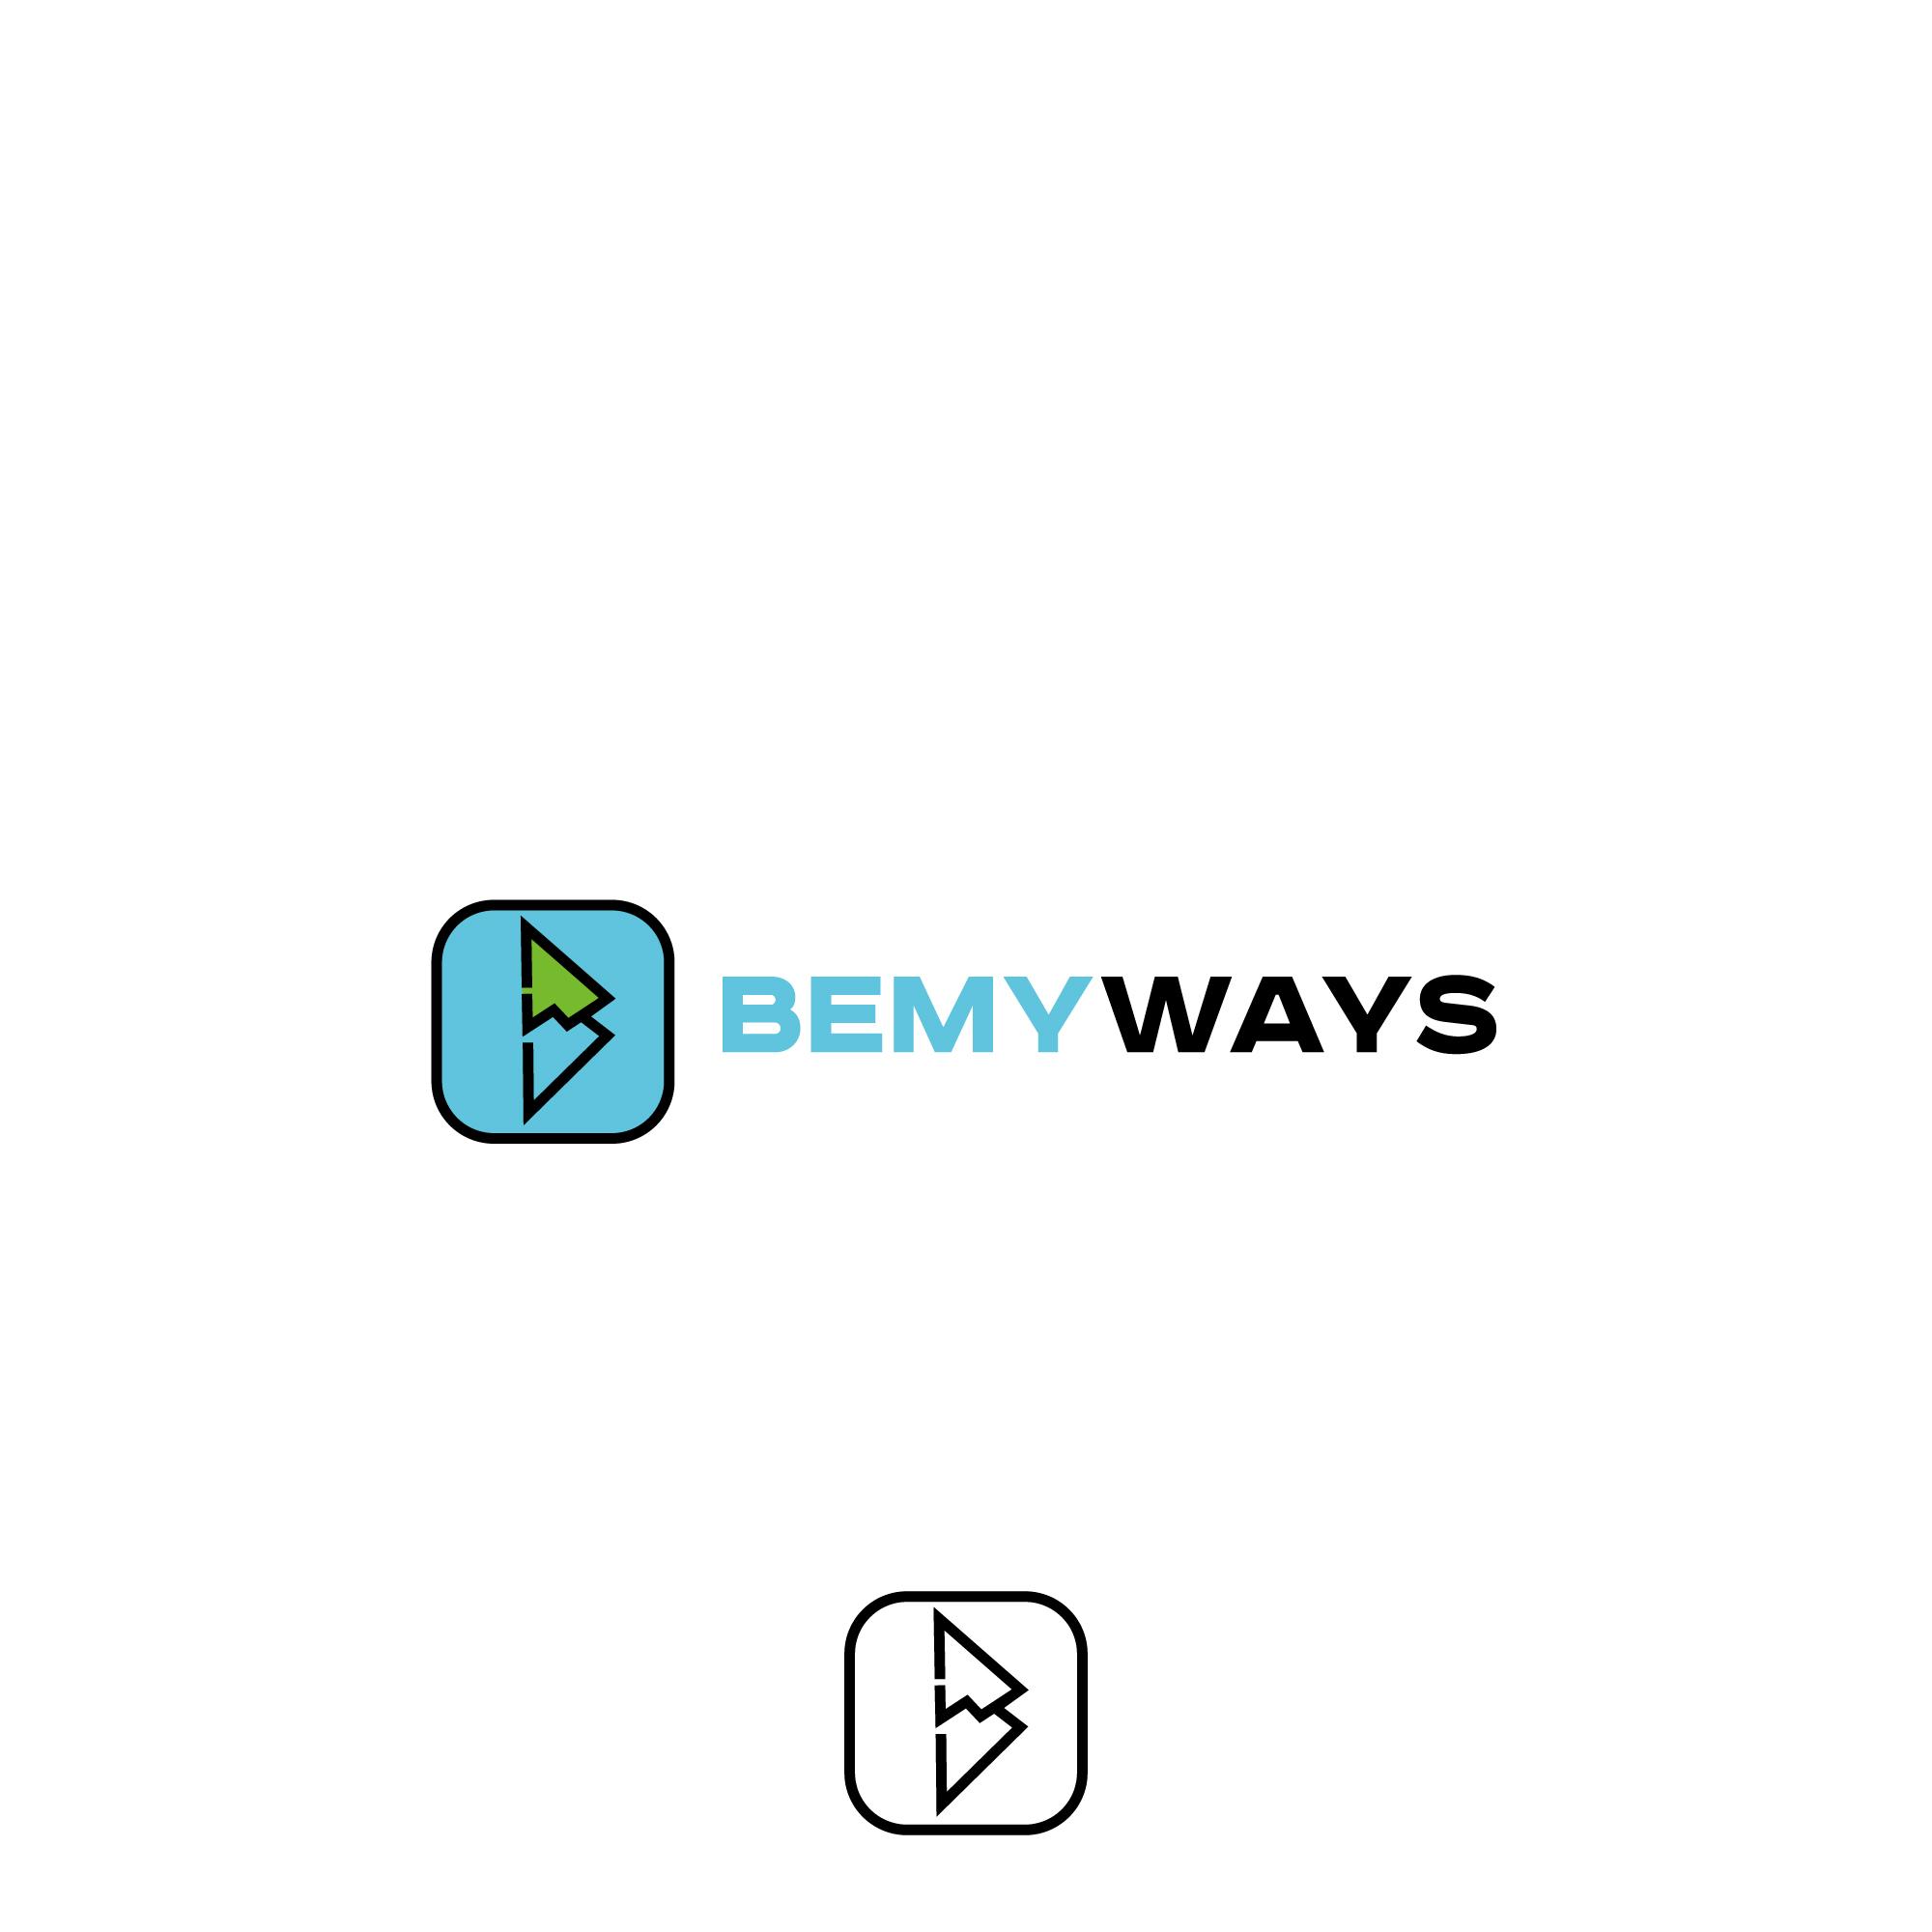 Разработка логотипа и иконки для Travel Video Platform фото f_5005c374d74e211c.jpg